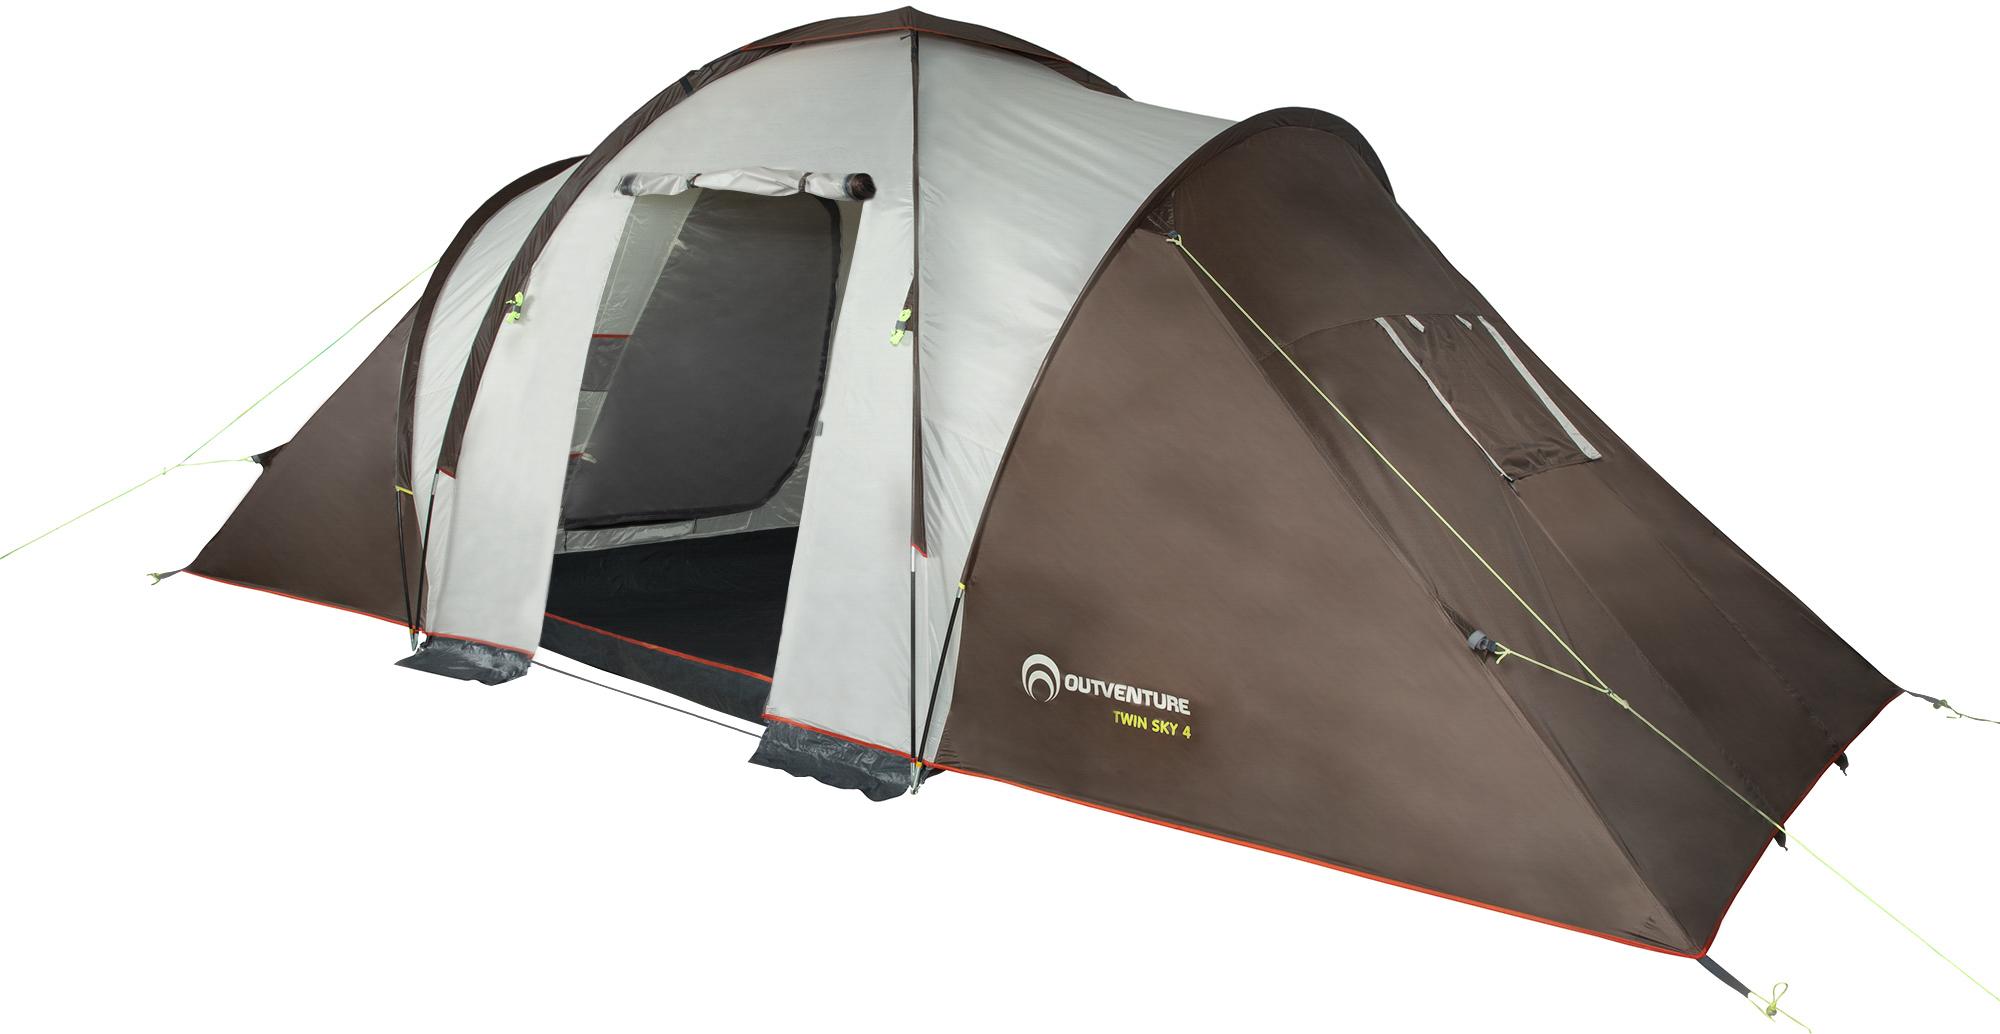 Outventure Tourist tent TWIN SKY 4 outventure outventure twin sky 4 basic